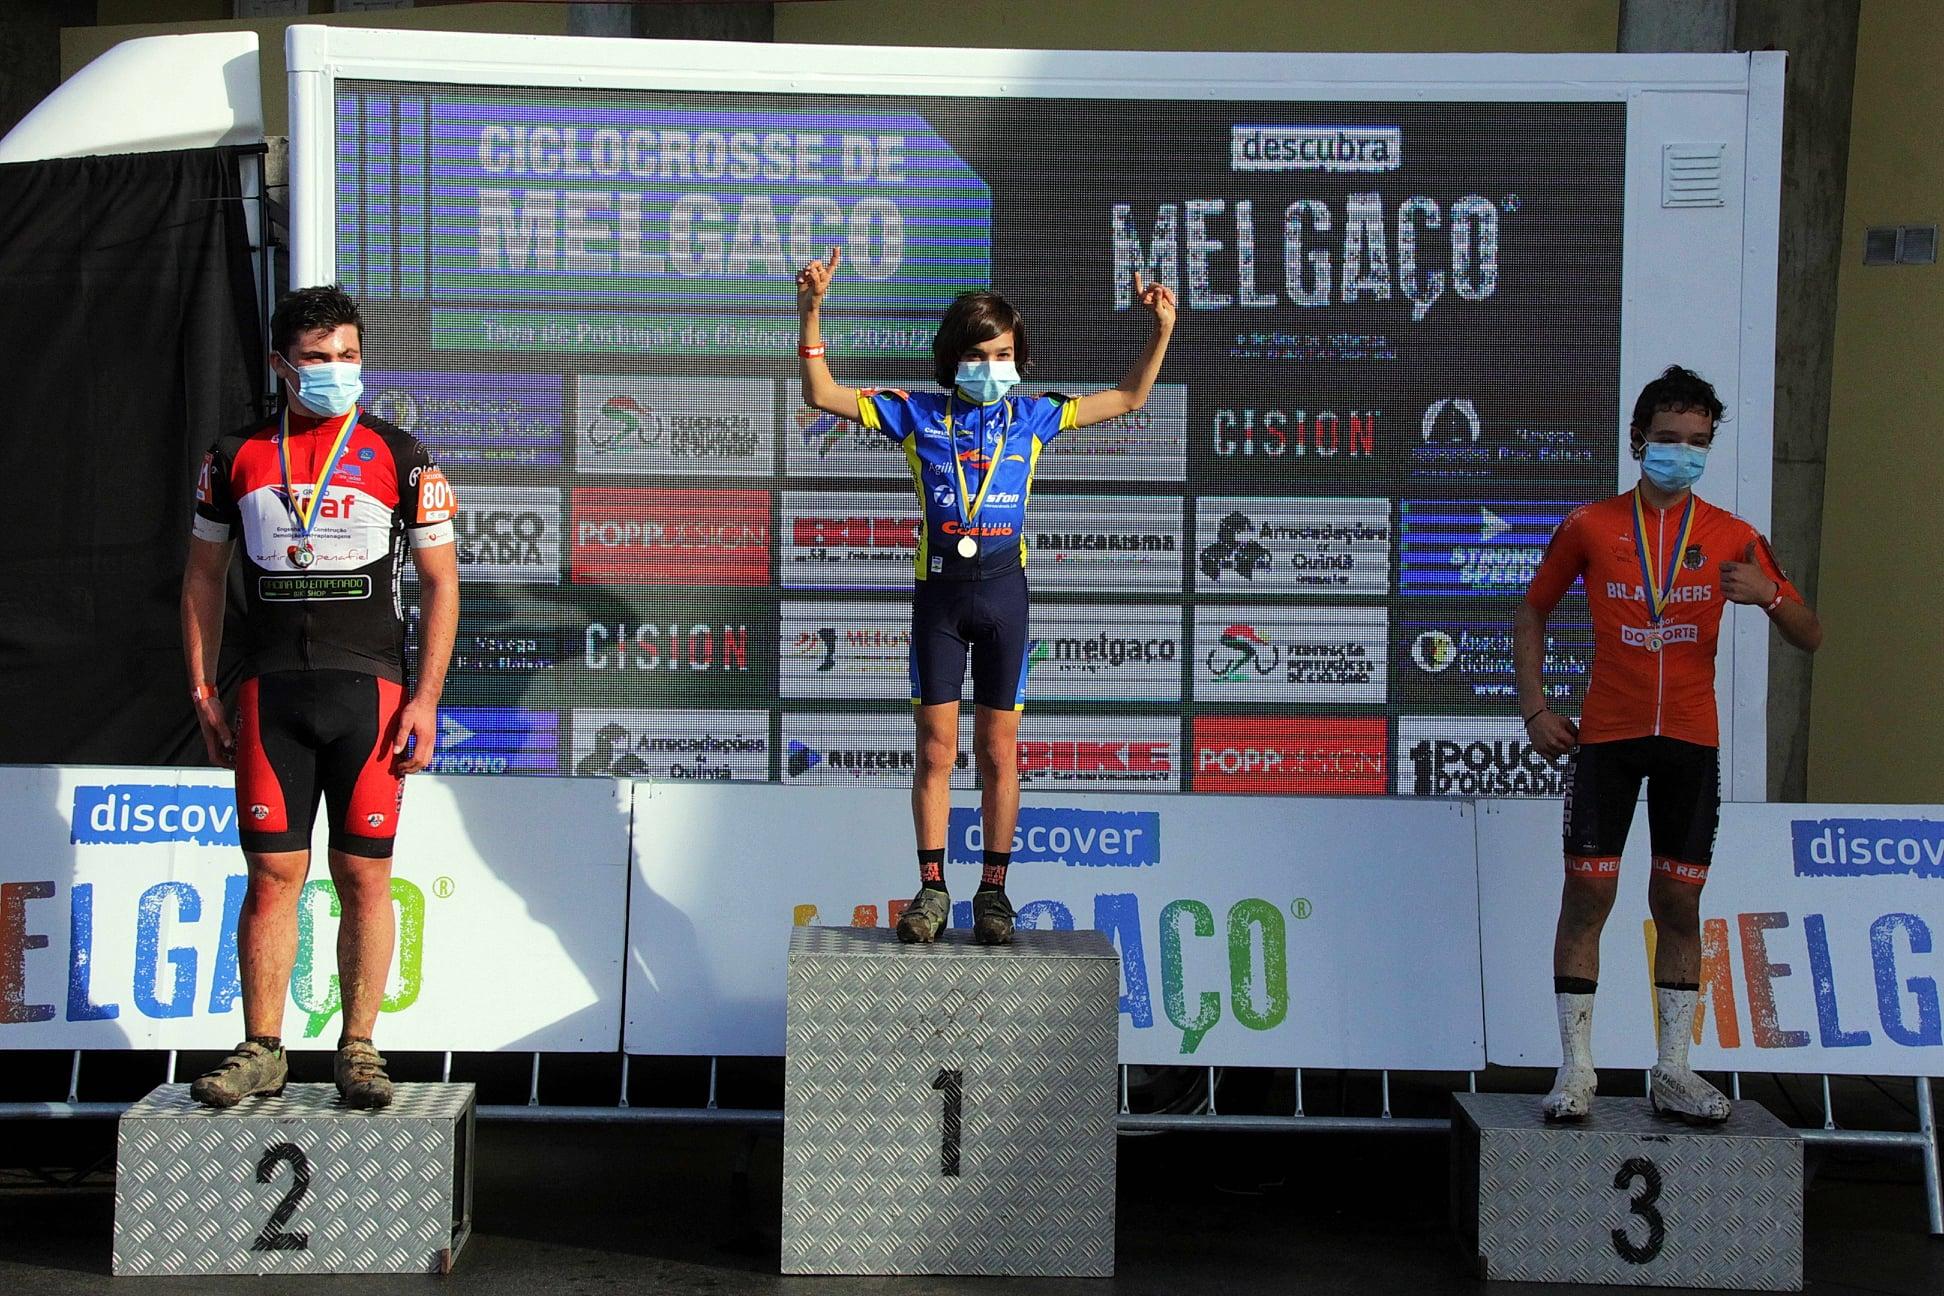 melgaço Taça de Portugal de Ciclocrosse 2020/2021